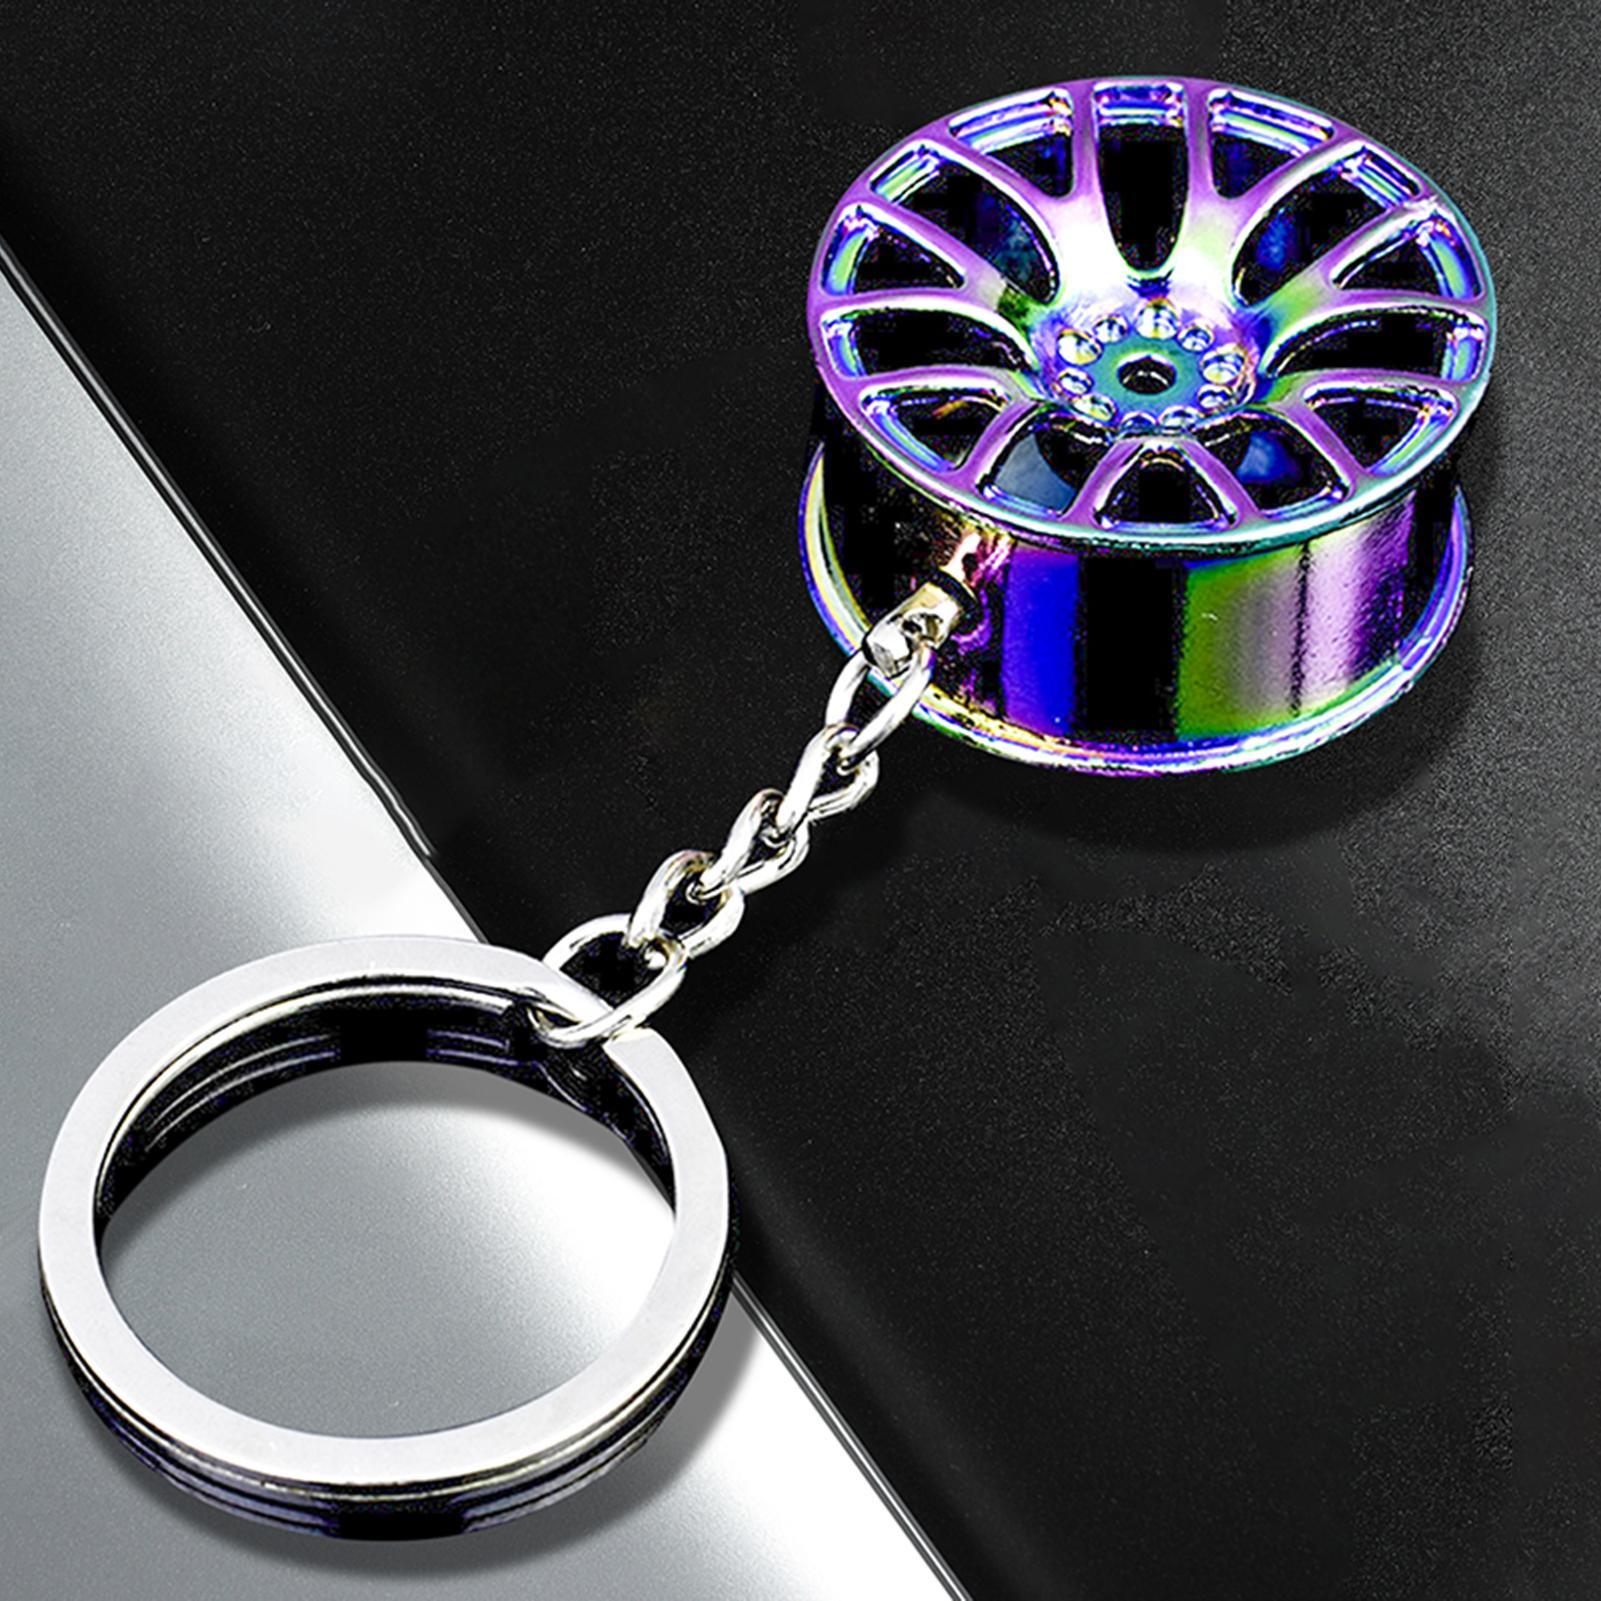 Hot wheel hub Auto Car Key Chain key ring creative wheel rim key chain key holder wheel rim keychain